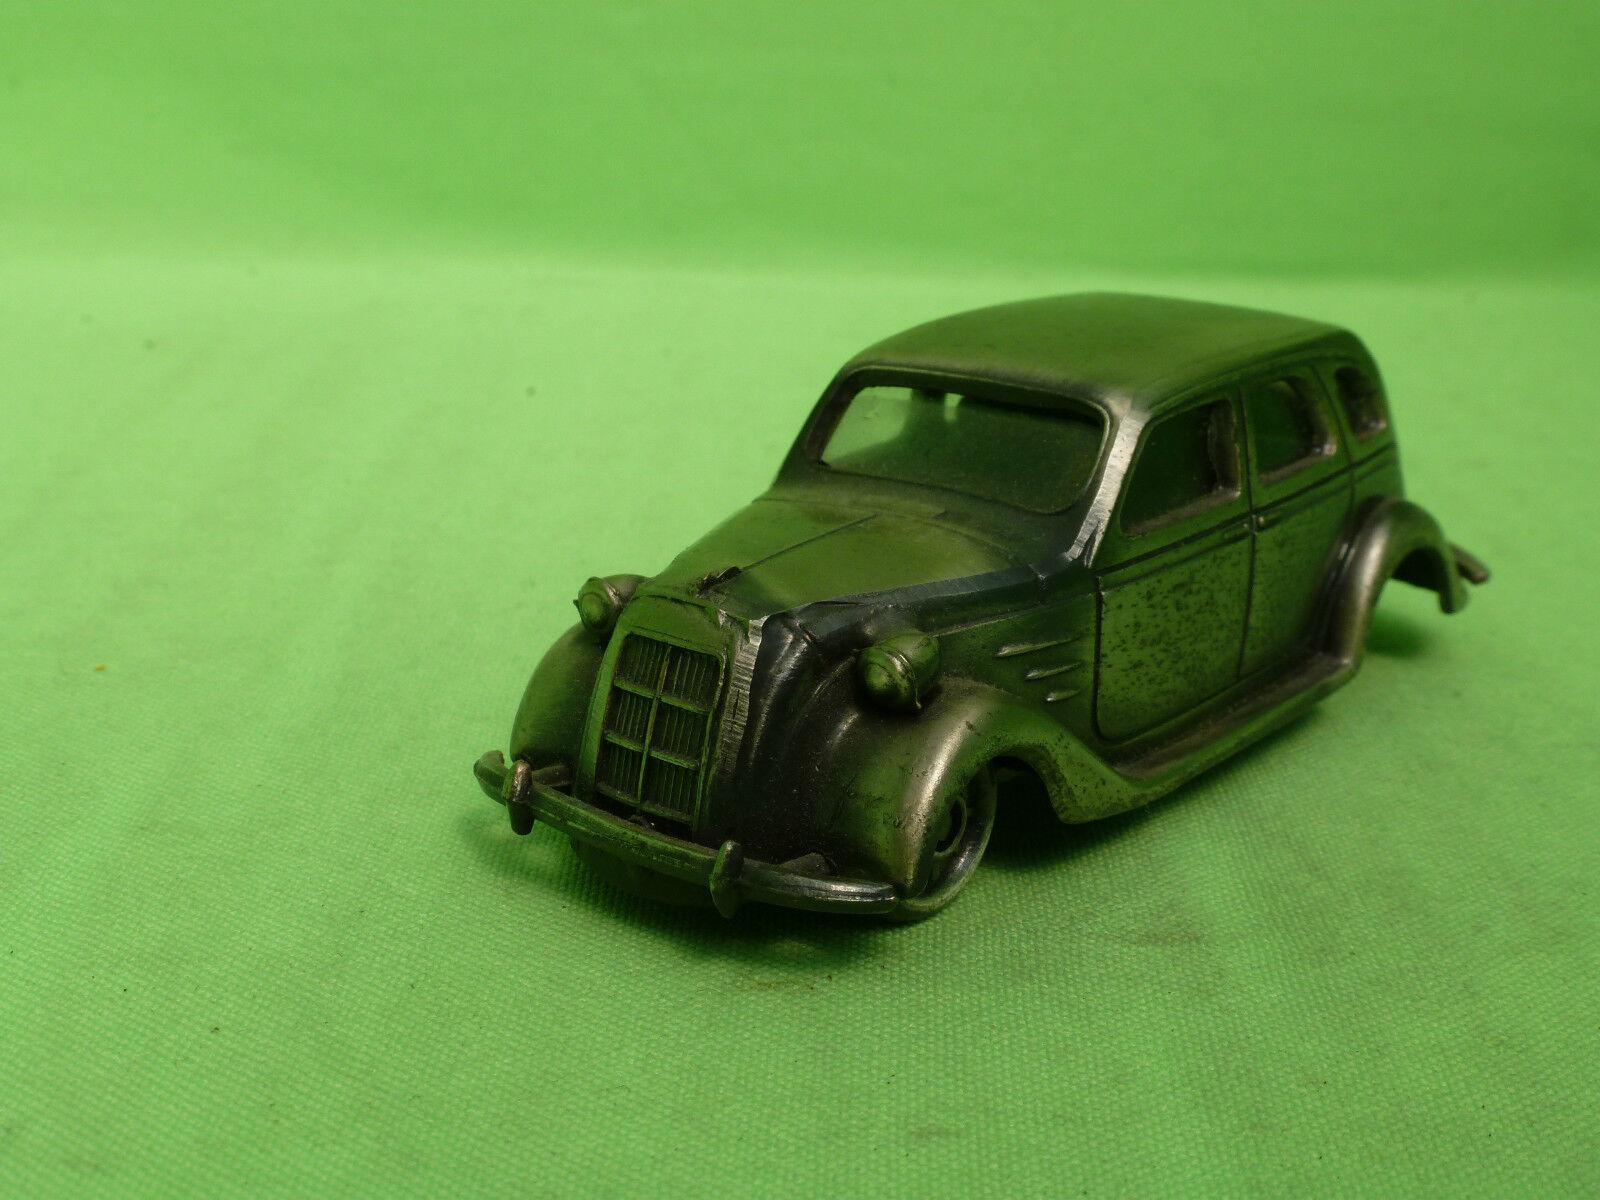 YONEZAWA DIAPET - CAR IN BRONZE COLOrosso METAL -  PLASTIC WINDOWS - MADE IN JAPAN